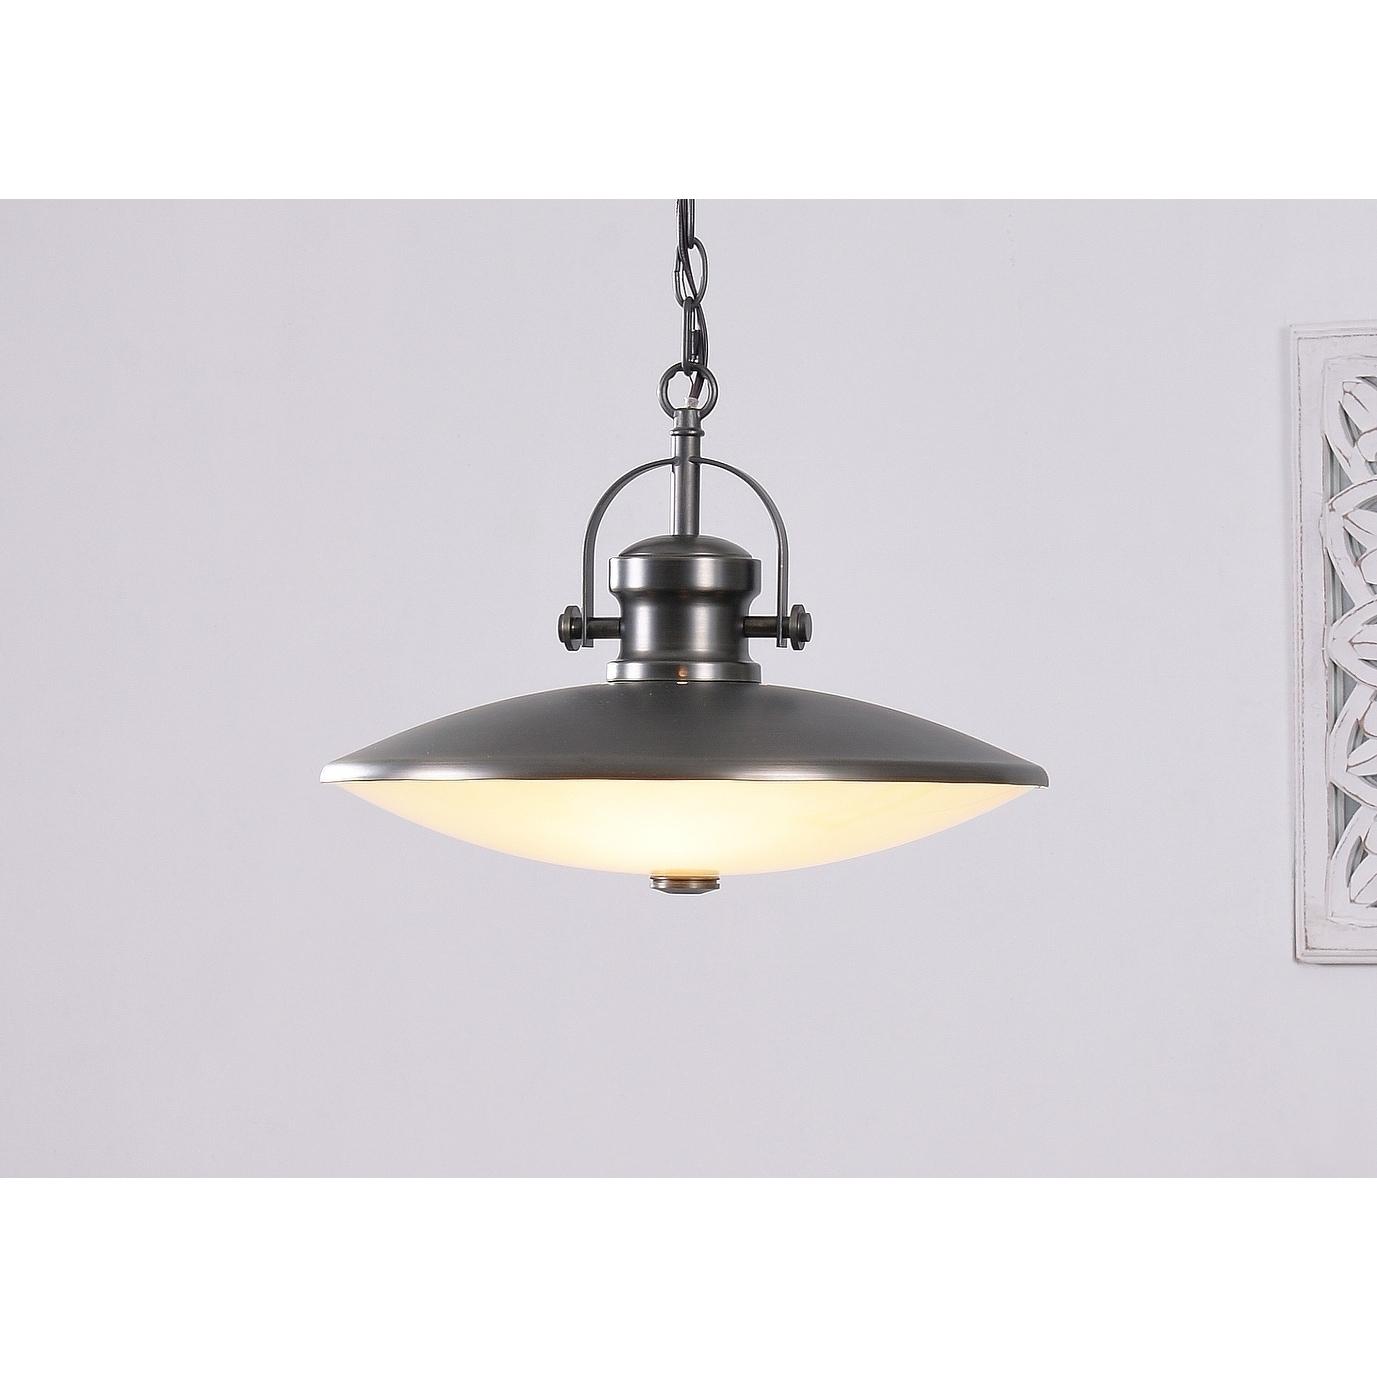 Shop tucson gunmetal 3 light pendant on sale free shipping today overstock com 18733220